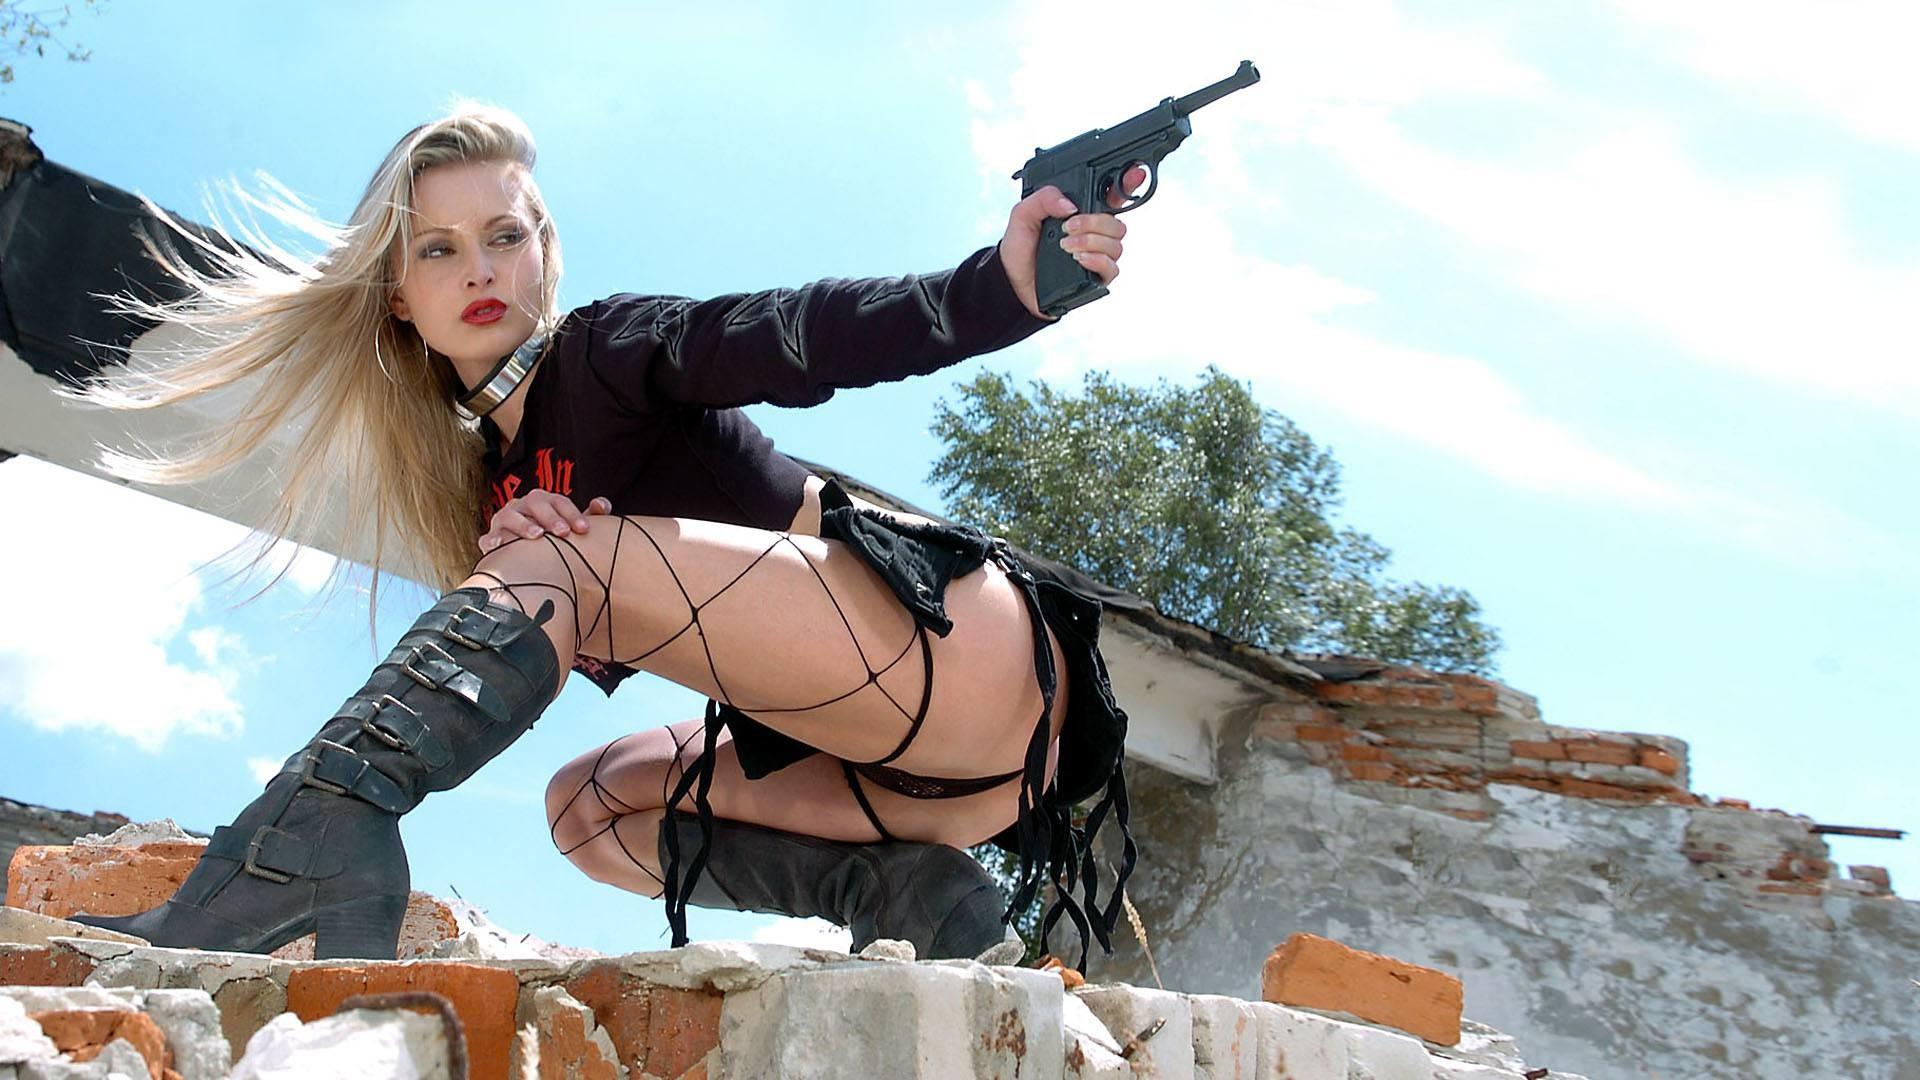 Girls With Guns Hd Wallpapers | Free HD Desktop Wallpapers .